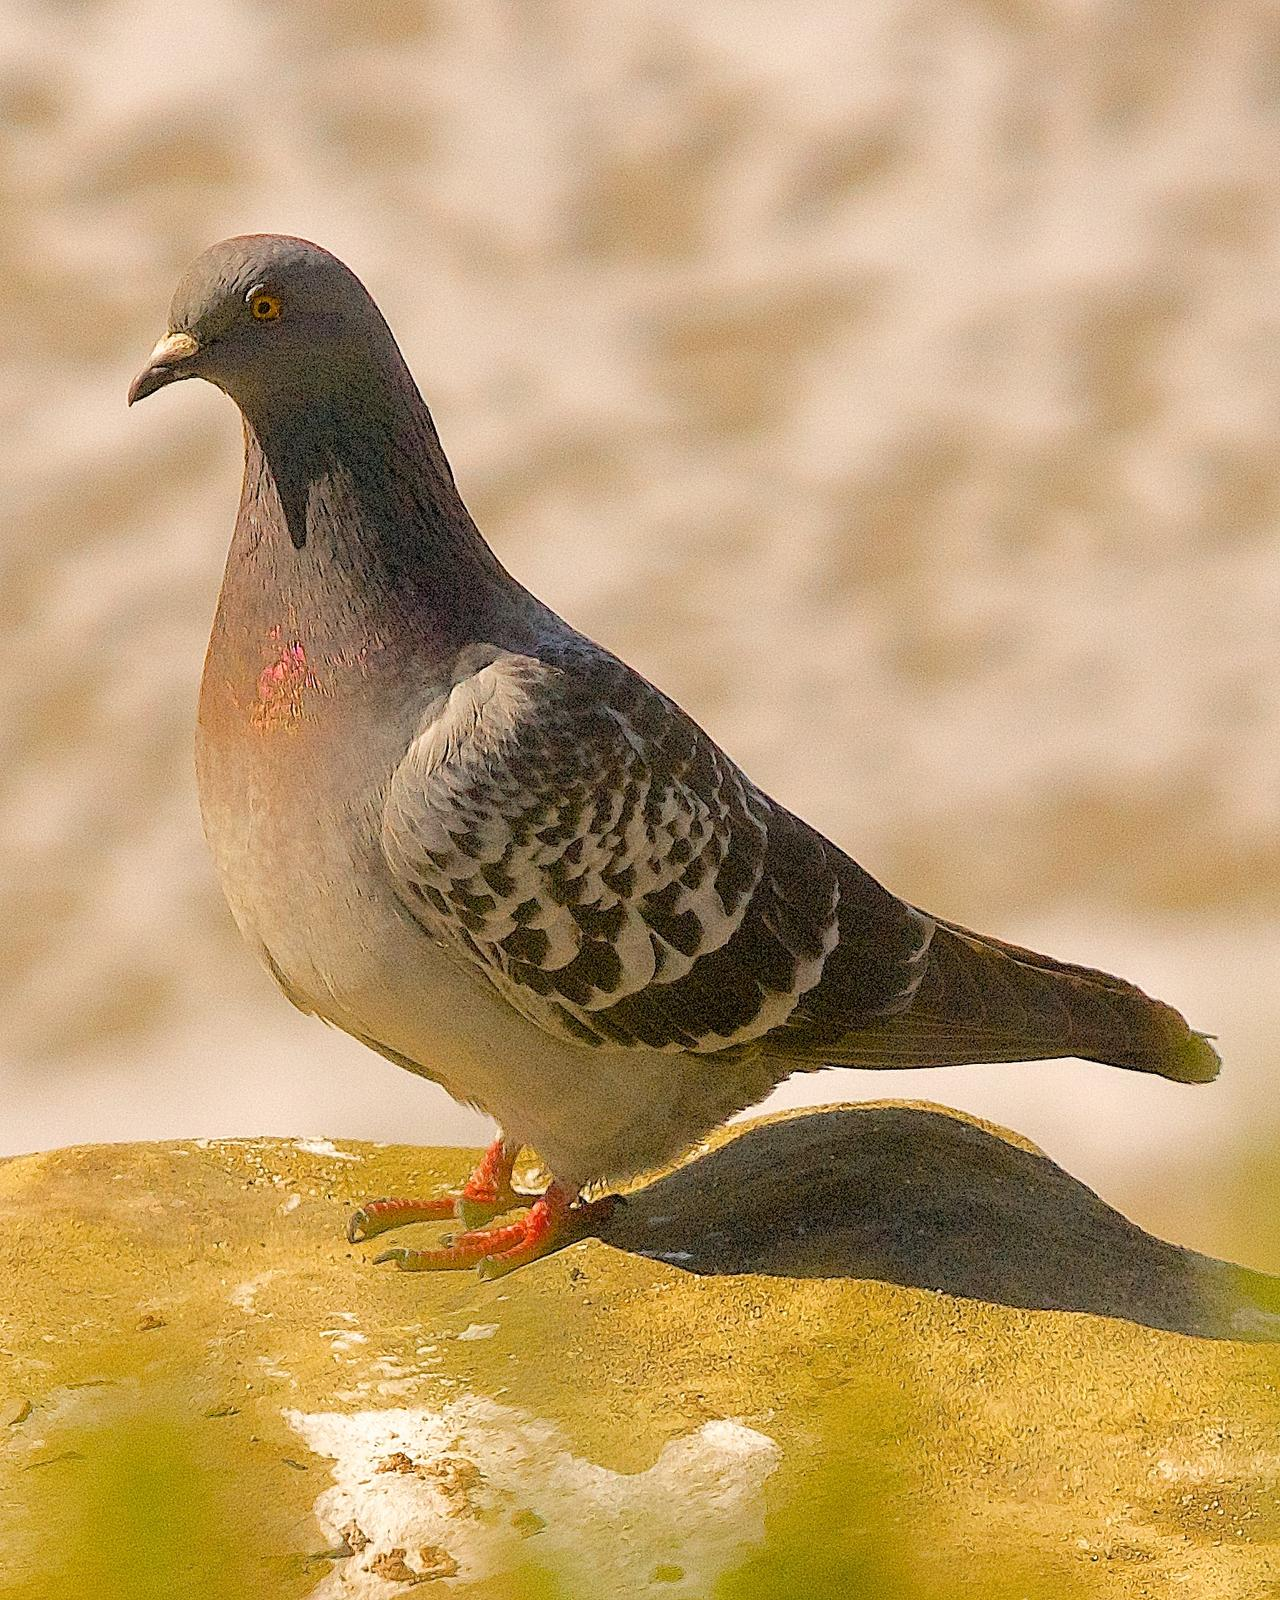 Rock Pigeon Photo by Gerald Hoekstra